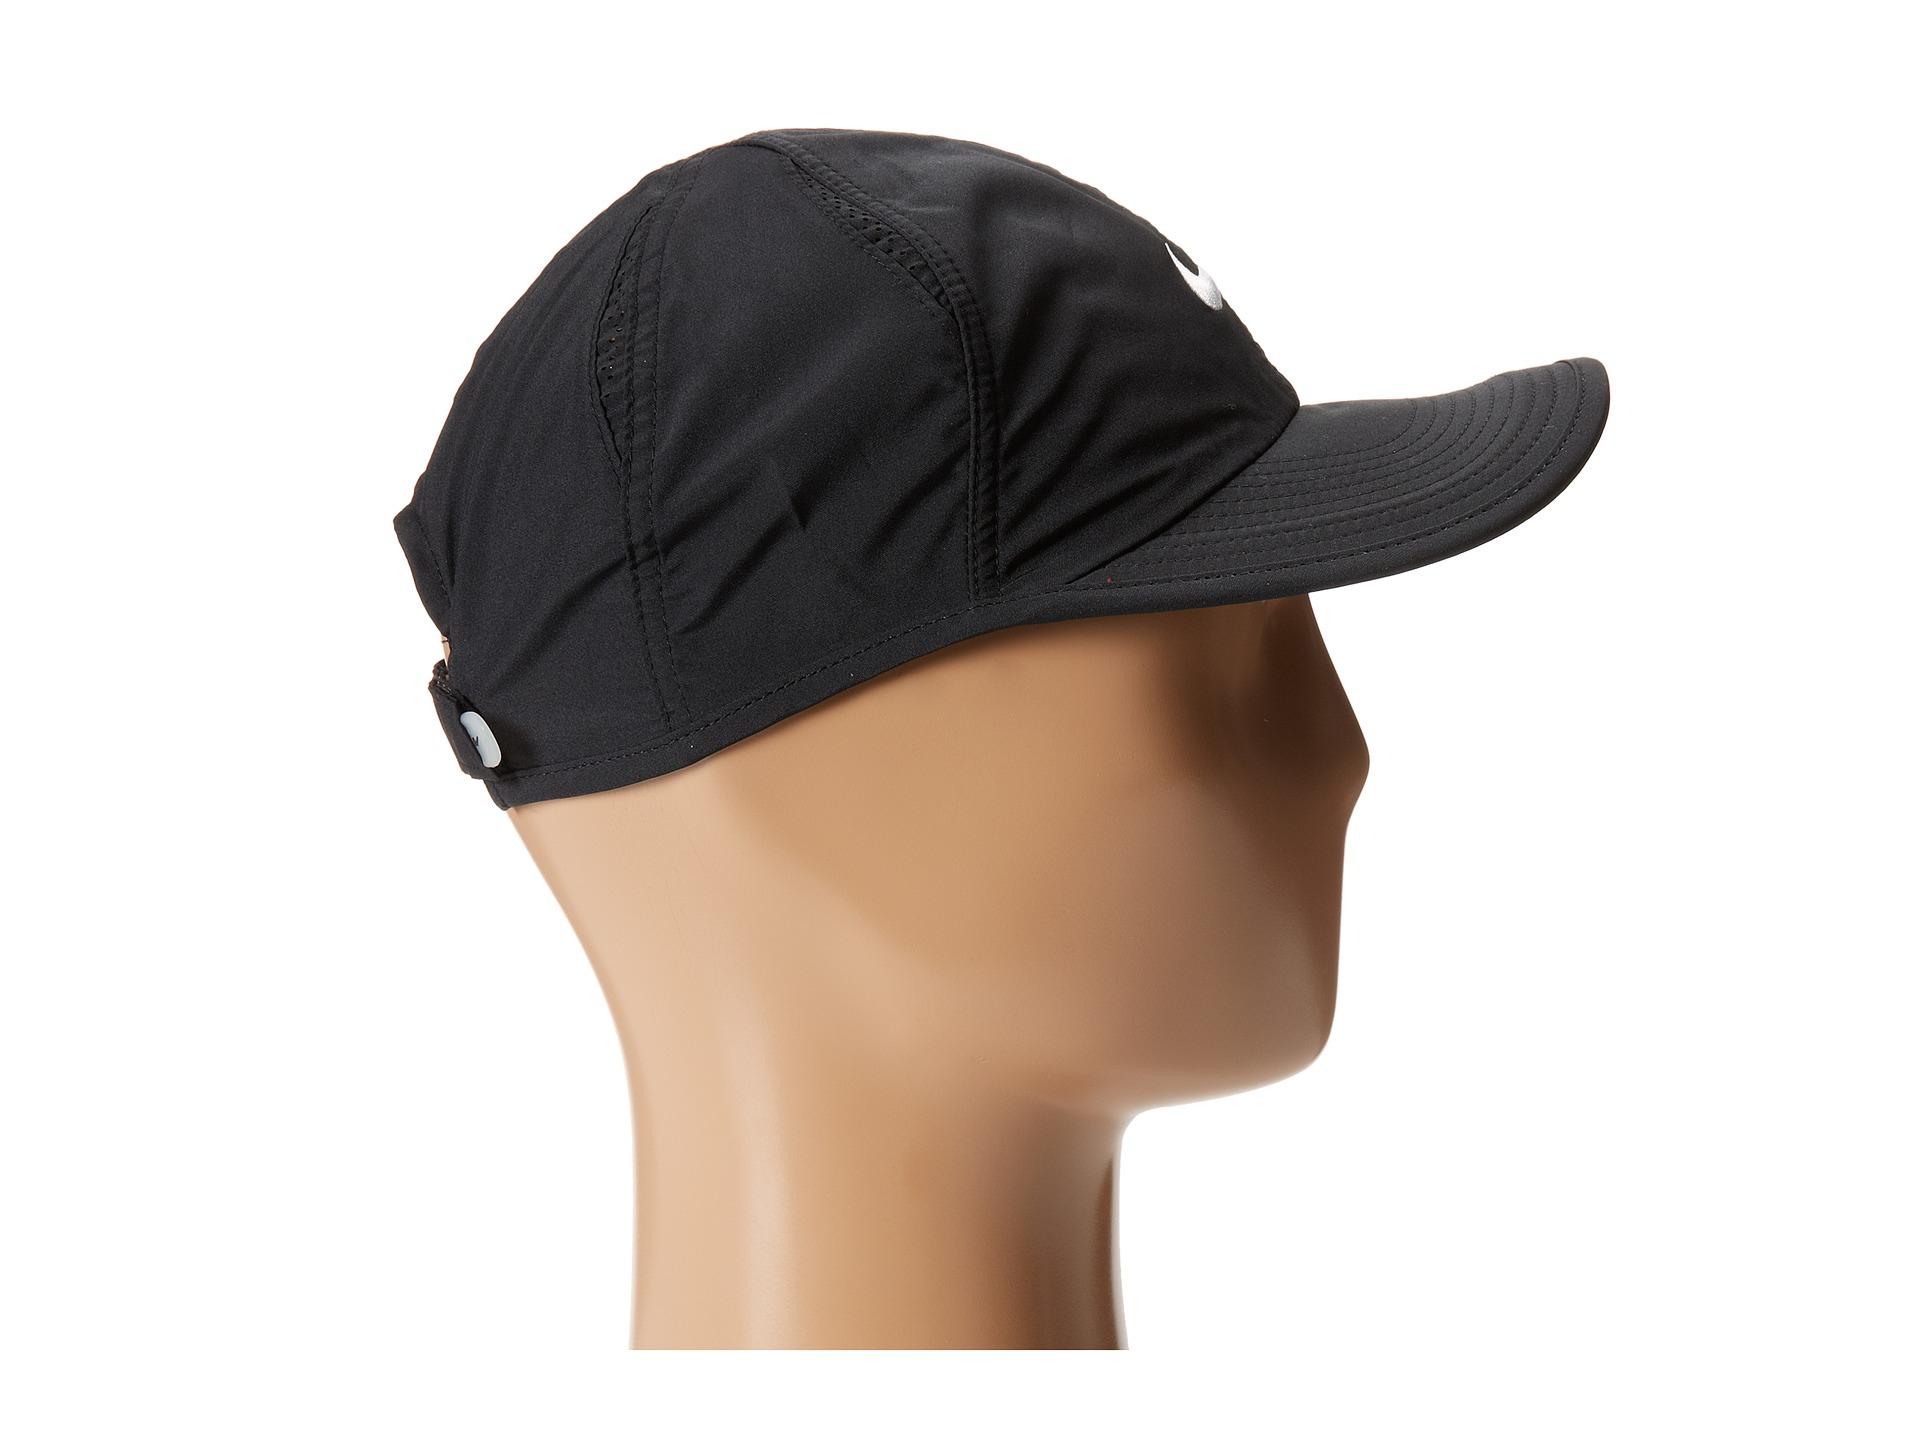 Lyst - Nike Featherlight Cap in Black 42f508875eb6